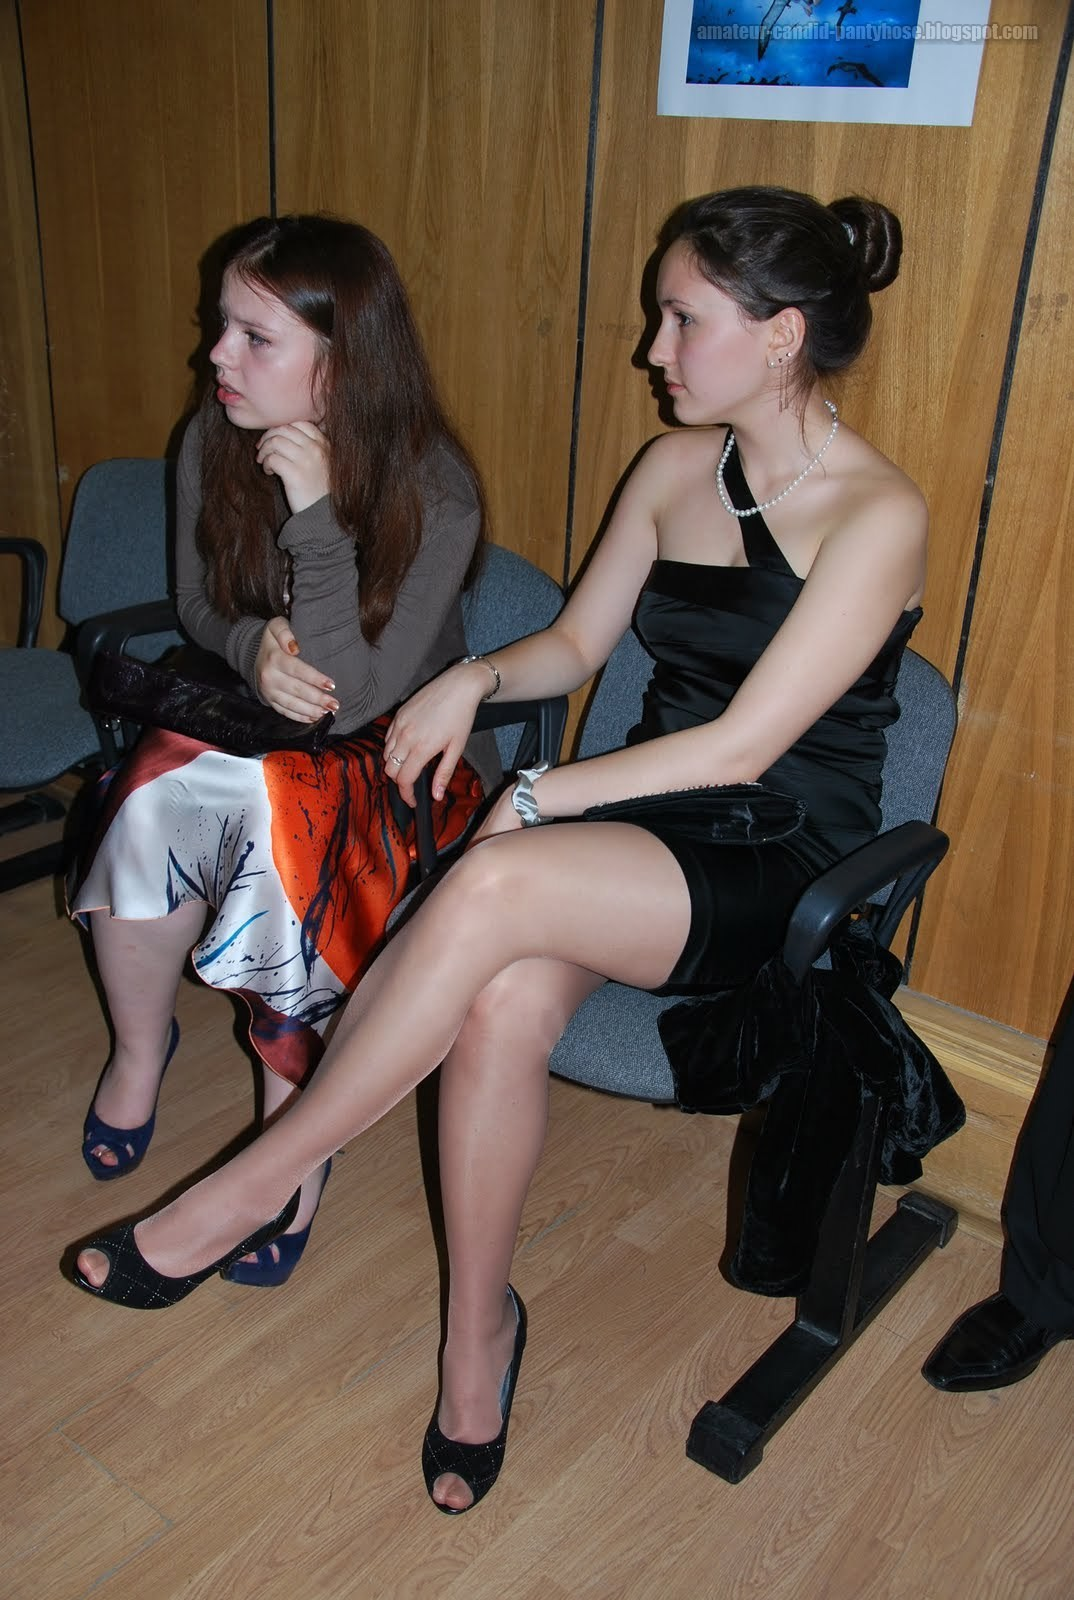 fashion tights skirt dress heels : candid amateur pantyhose 2